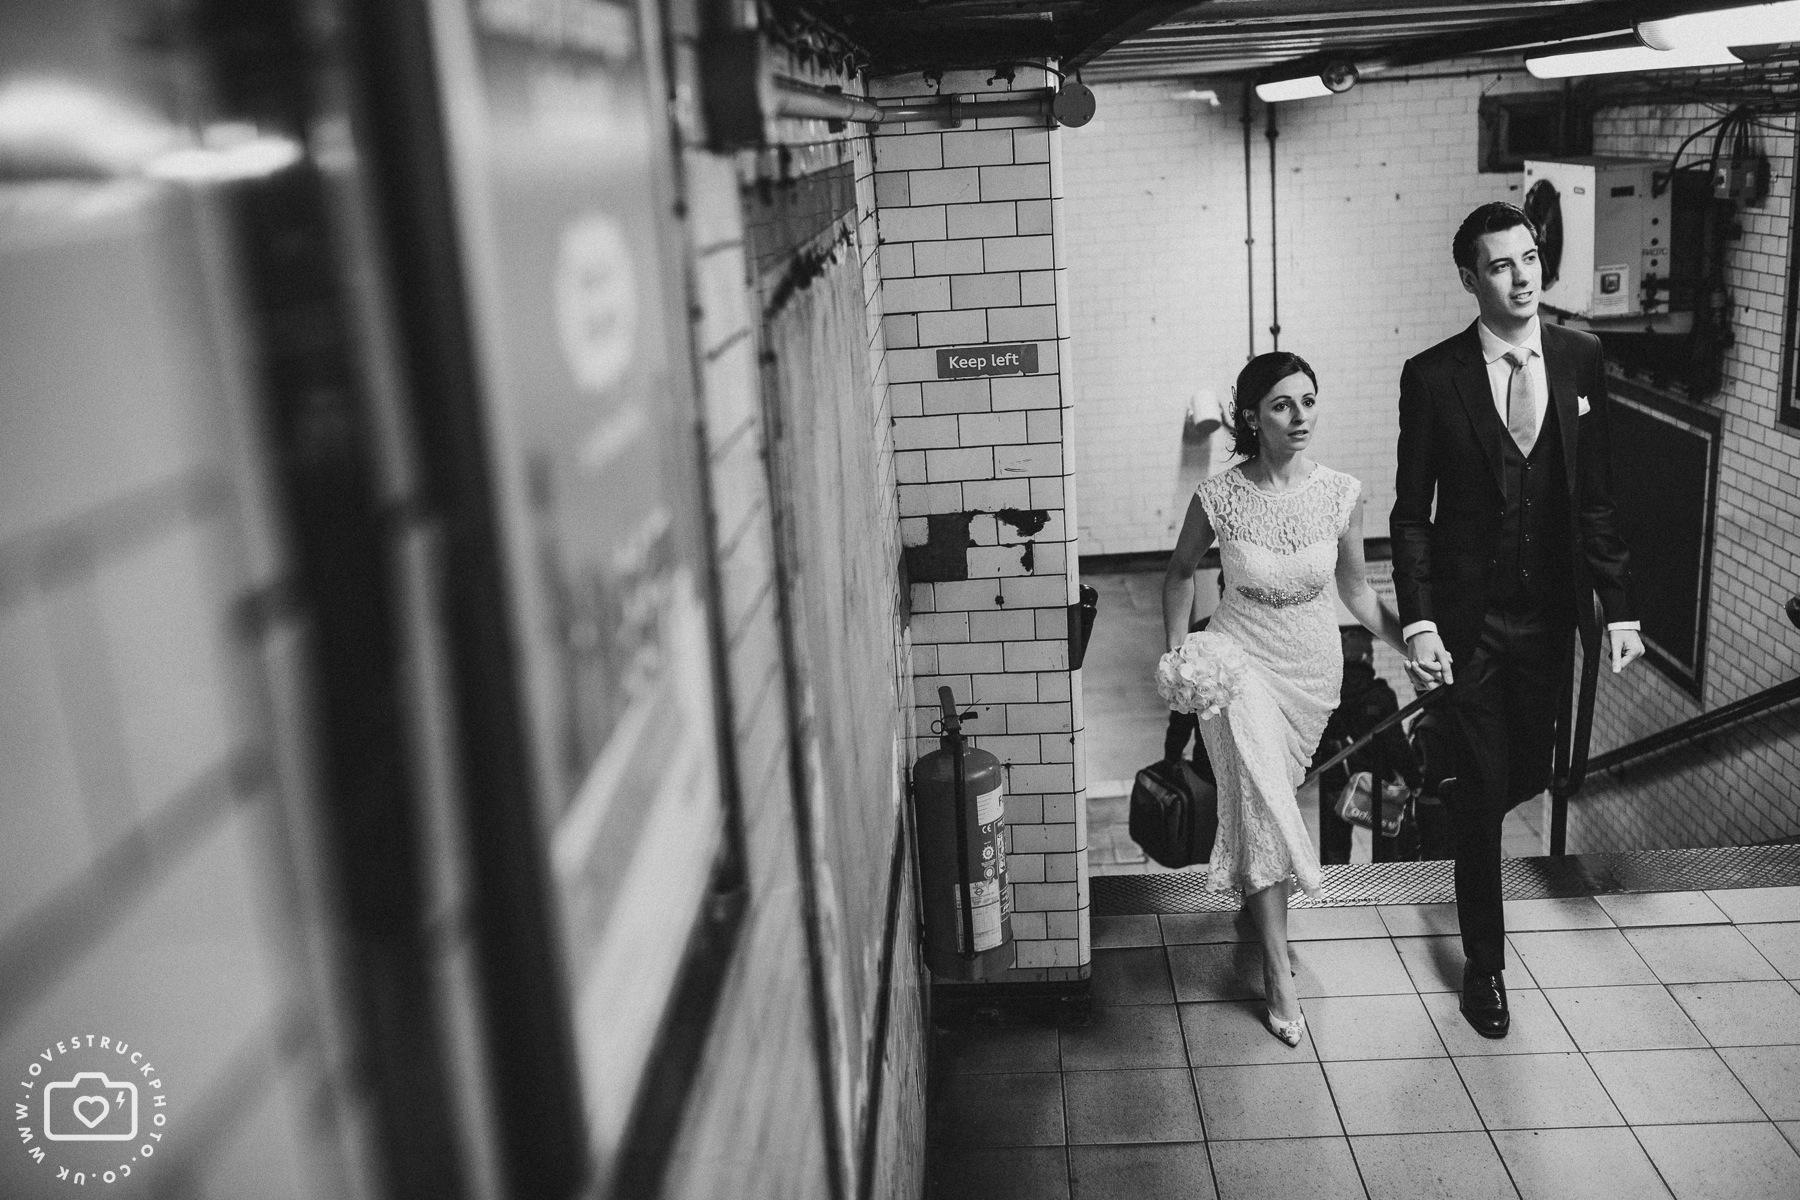 London Tube Wedding